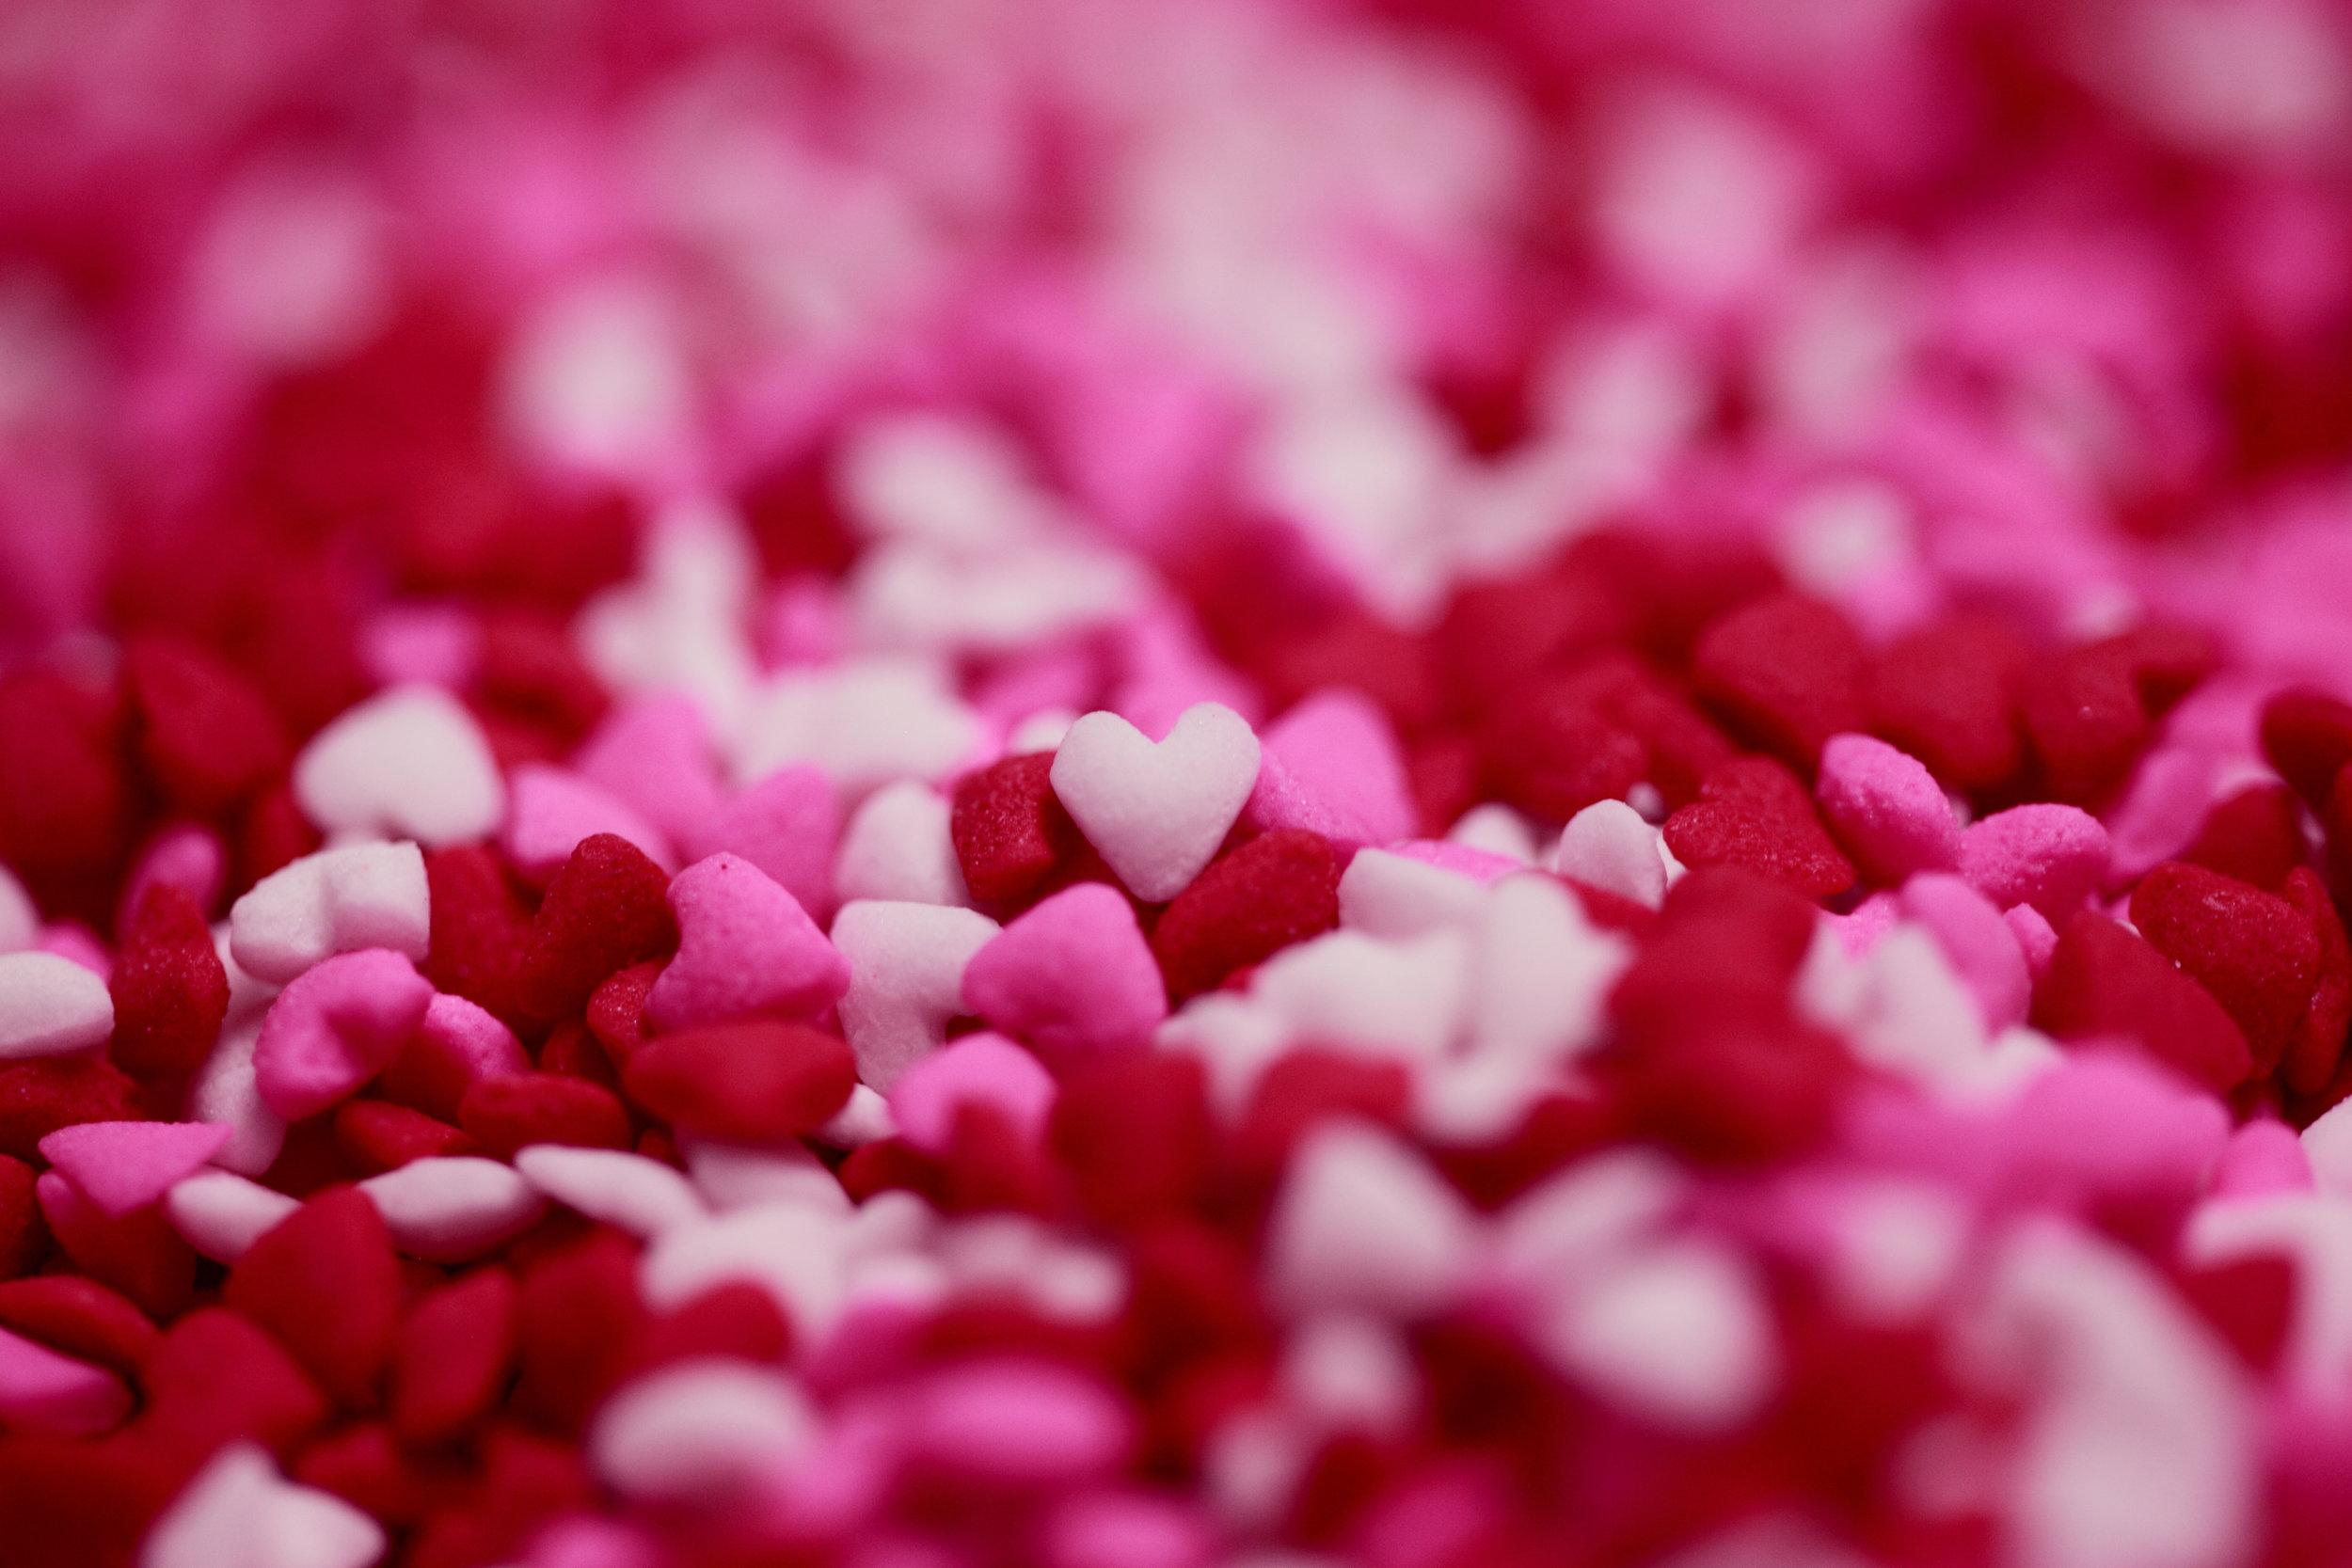 Why Do You Love Me? - © 2016Genre: Soft RockTheme: Valentine's Day